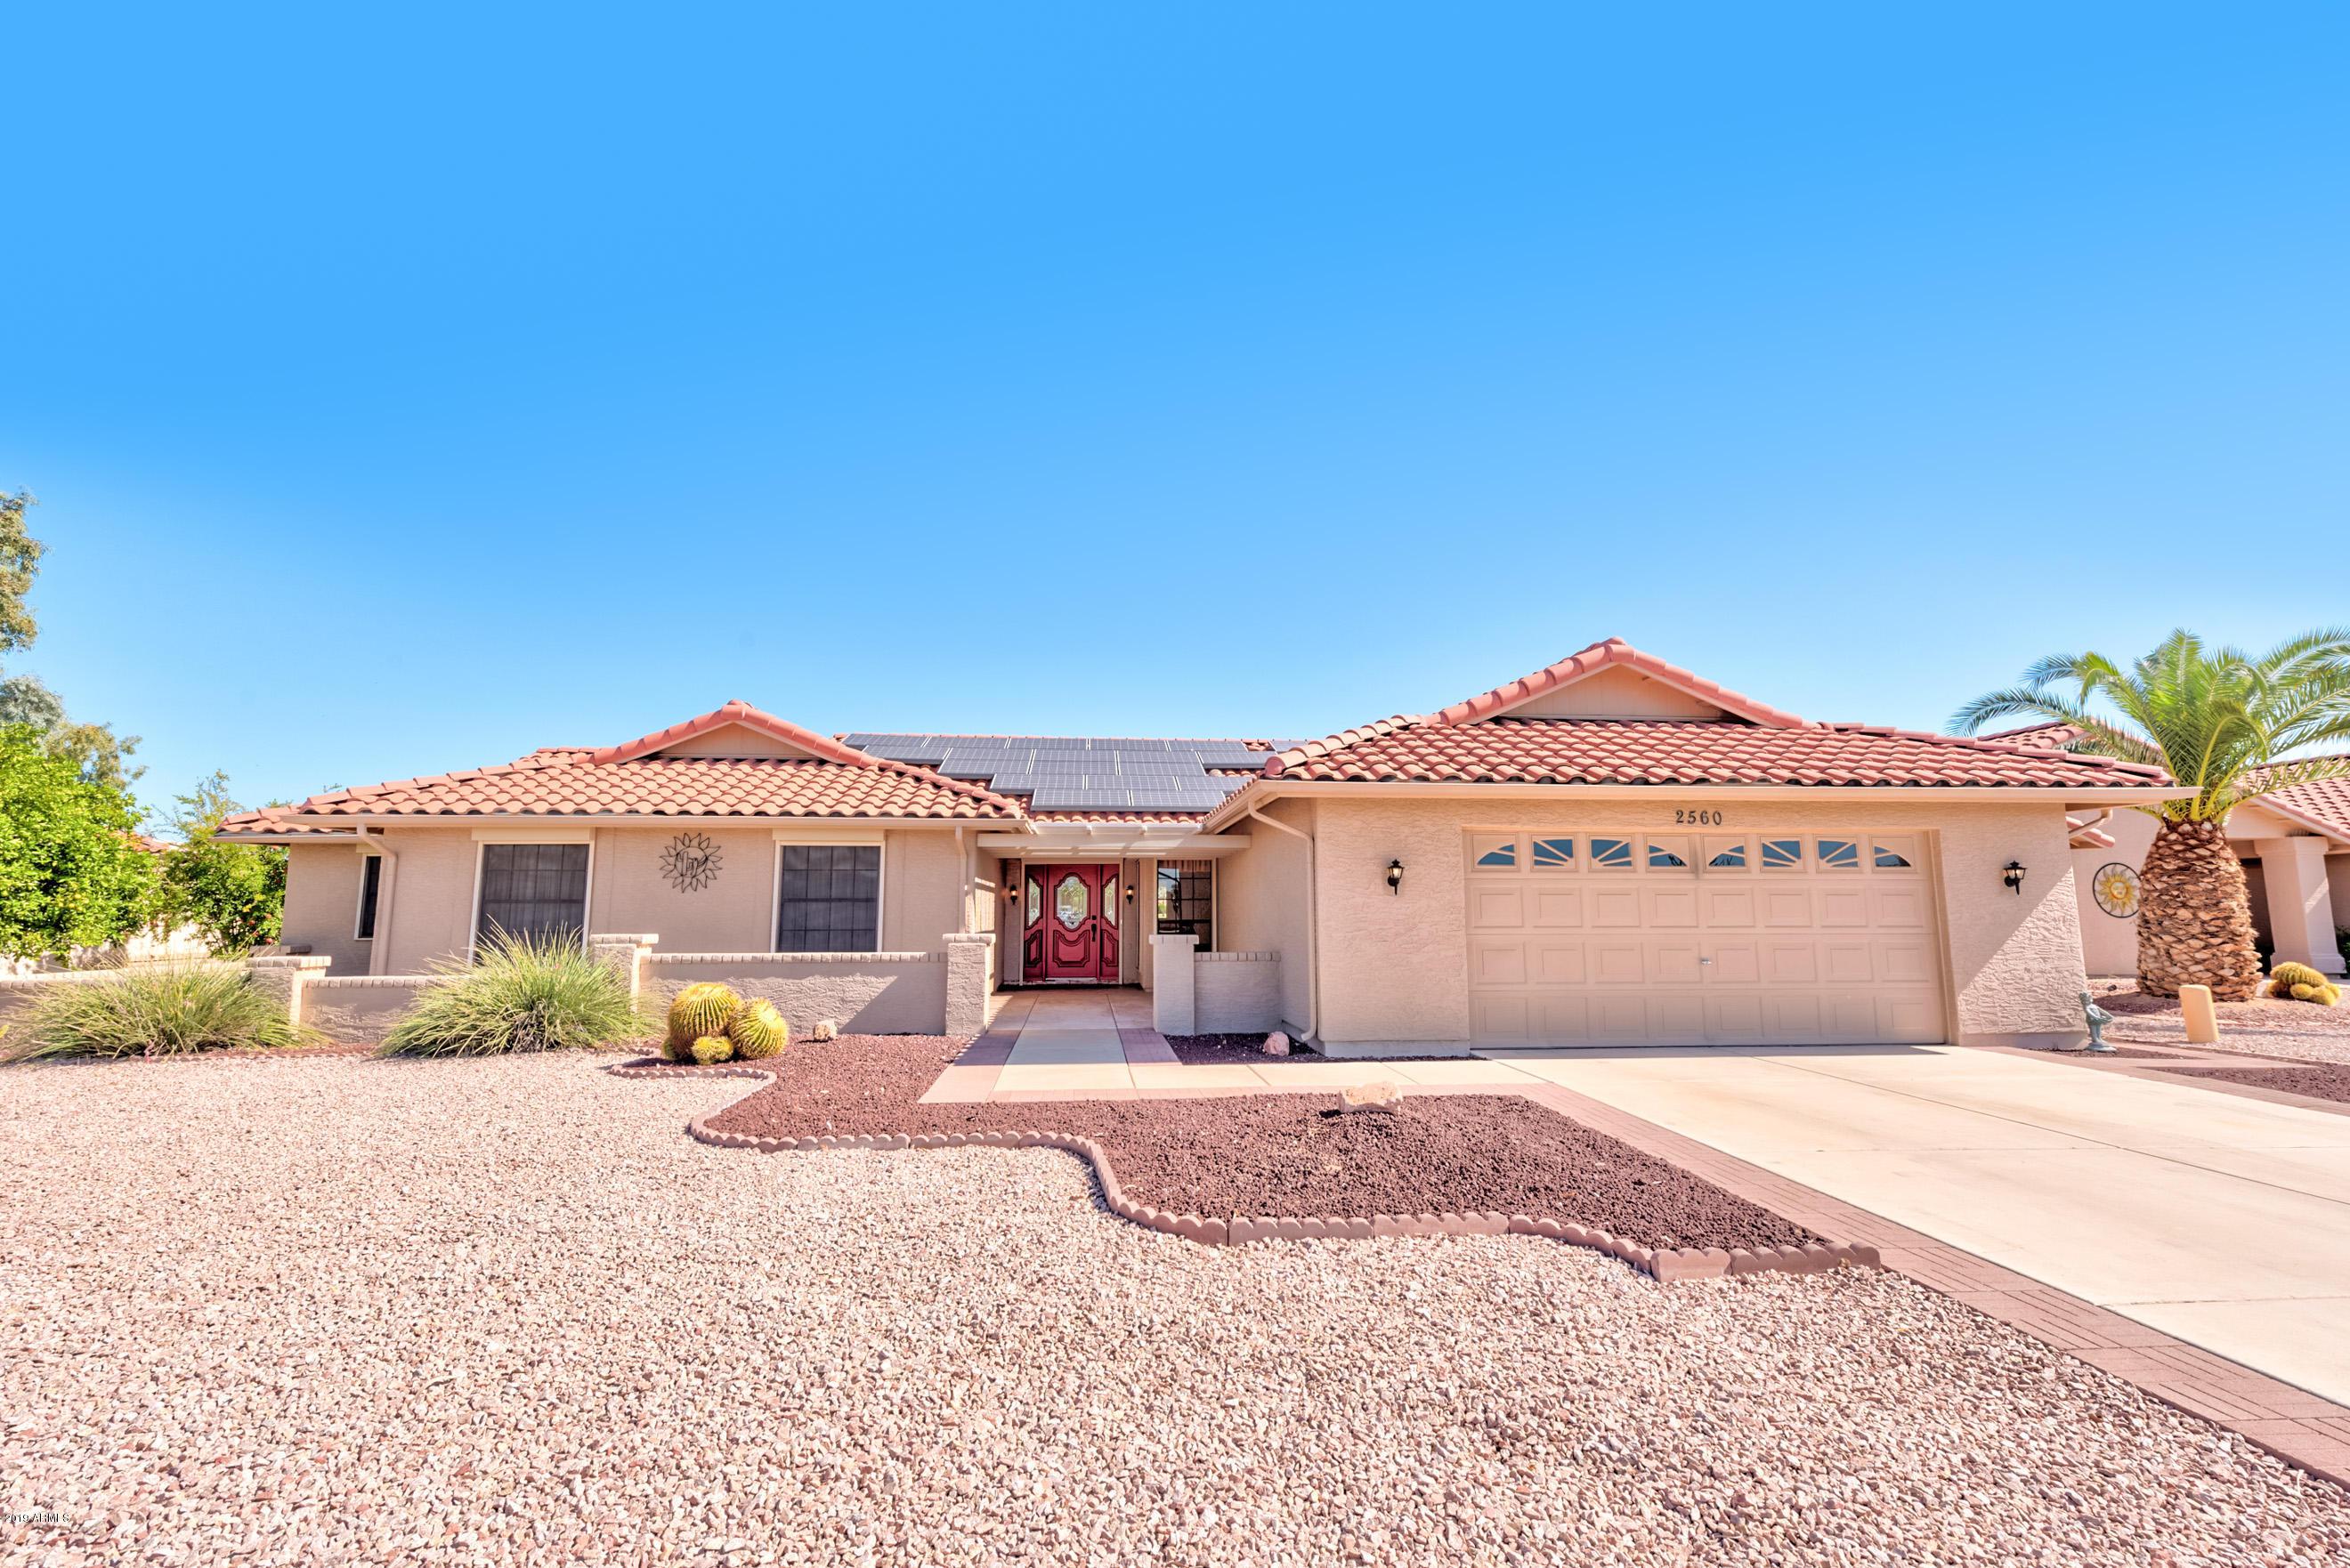 Photo of 2560 LEISURE WORLD --, Mesa, AZ 85206